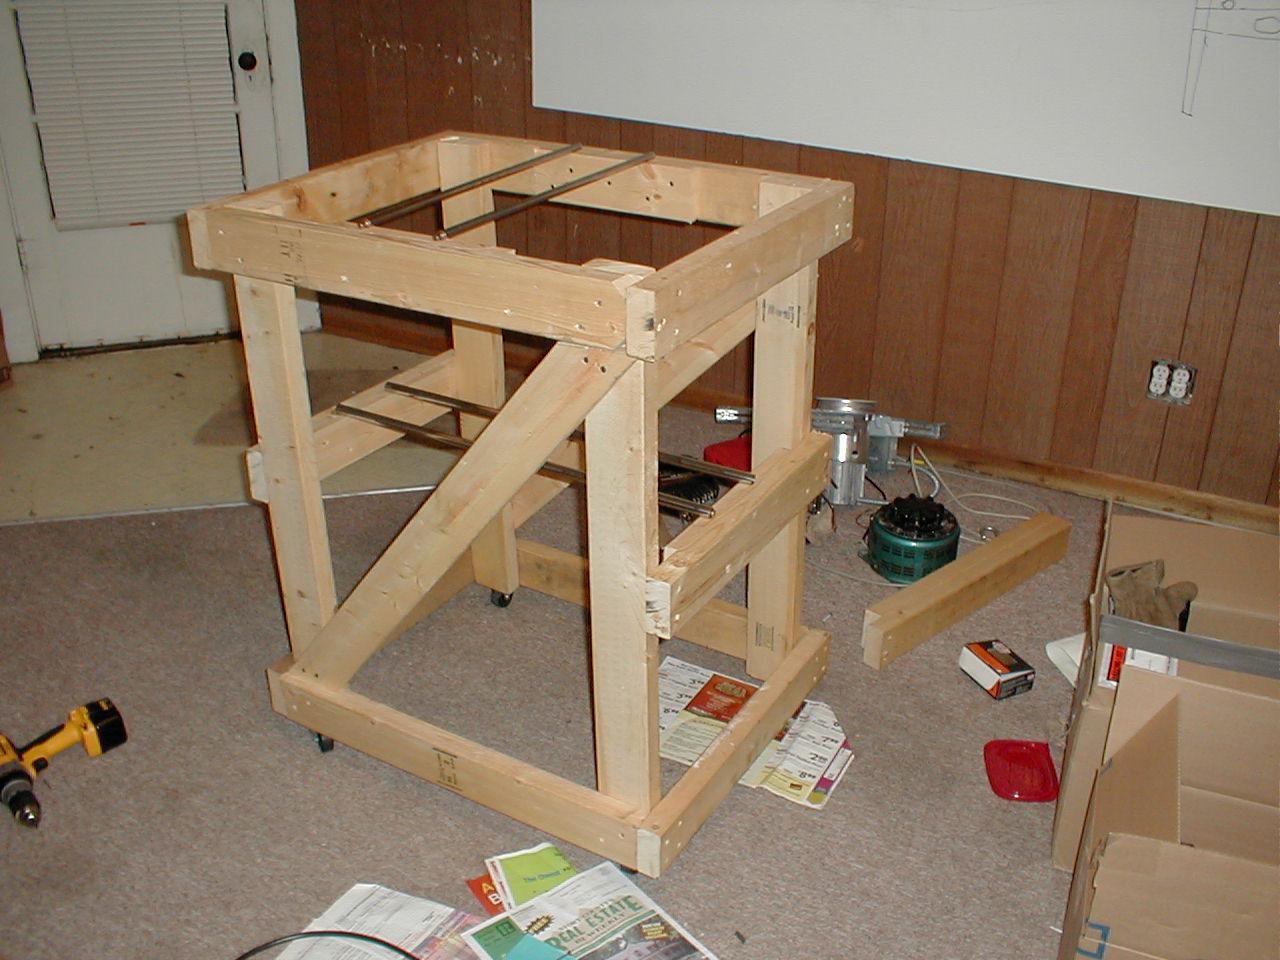 Picture of Constructing  a RepRap: Part 1